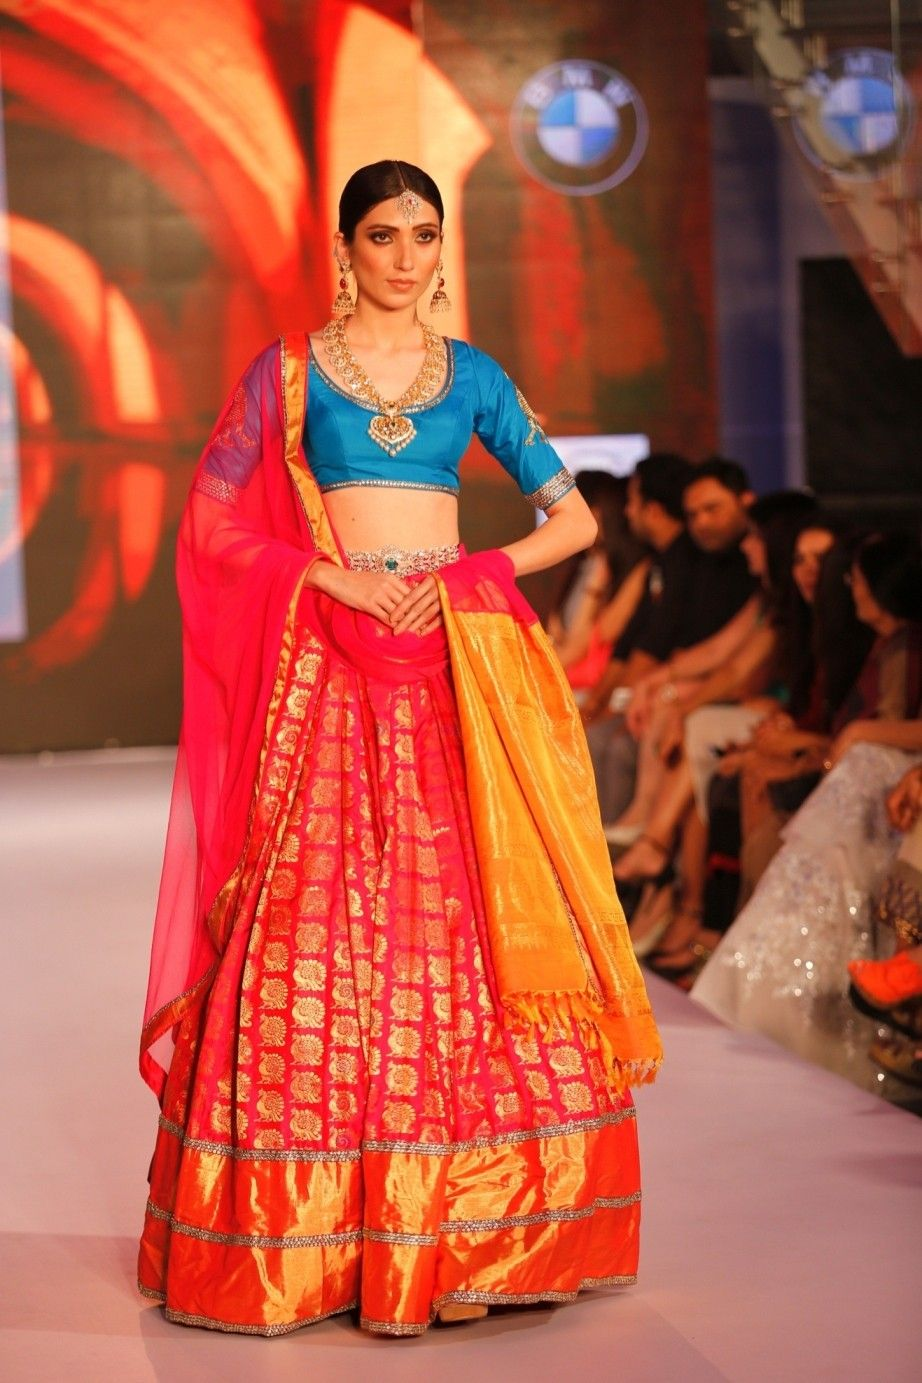 52a42fe708e5 Pink Silk Sequins Kanjivaram Lehenga With Blouse #bandbaajaa.com  #weddinglehengas #bridallehangas #shaadilehengas #designerlehengas  #lehengacholi ...